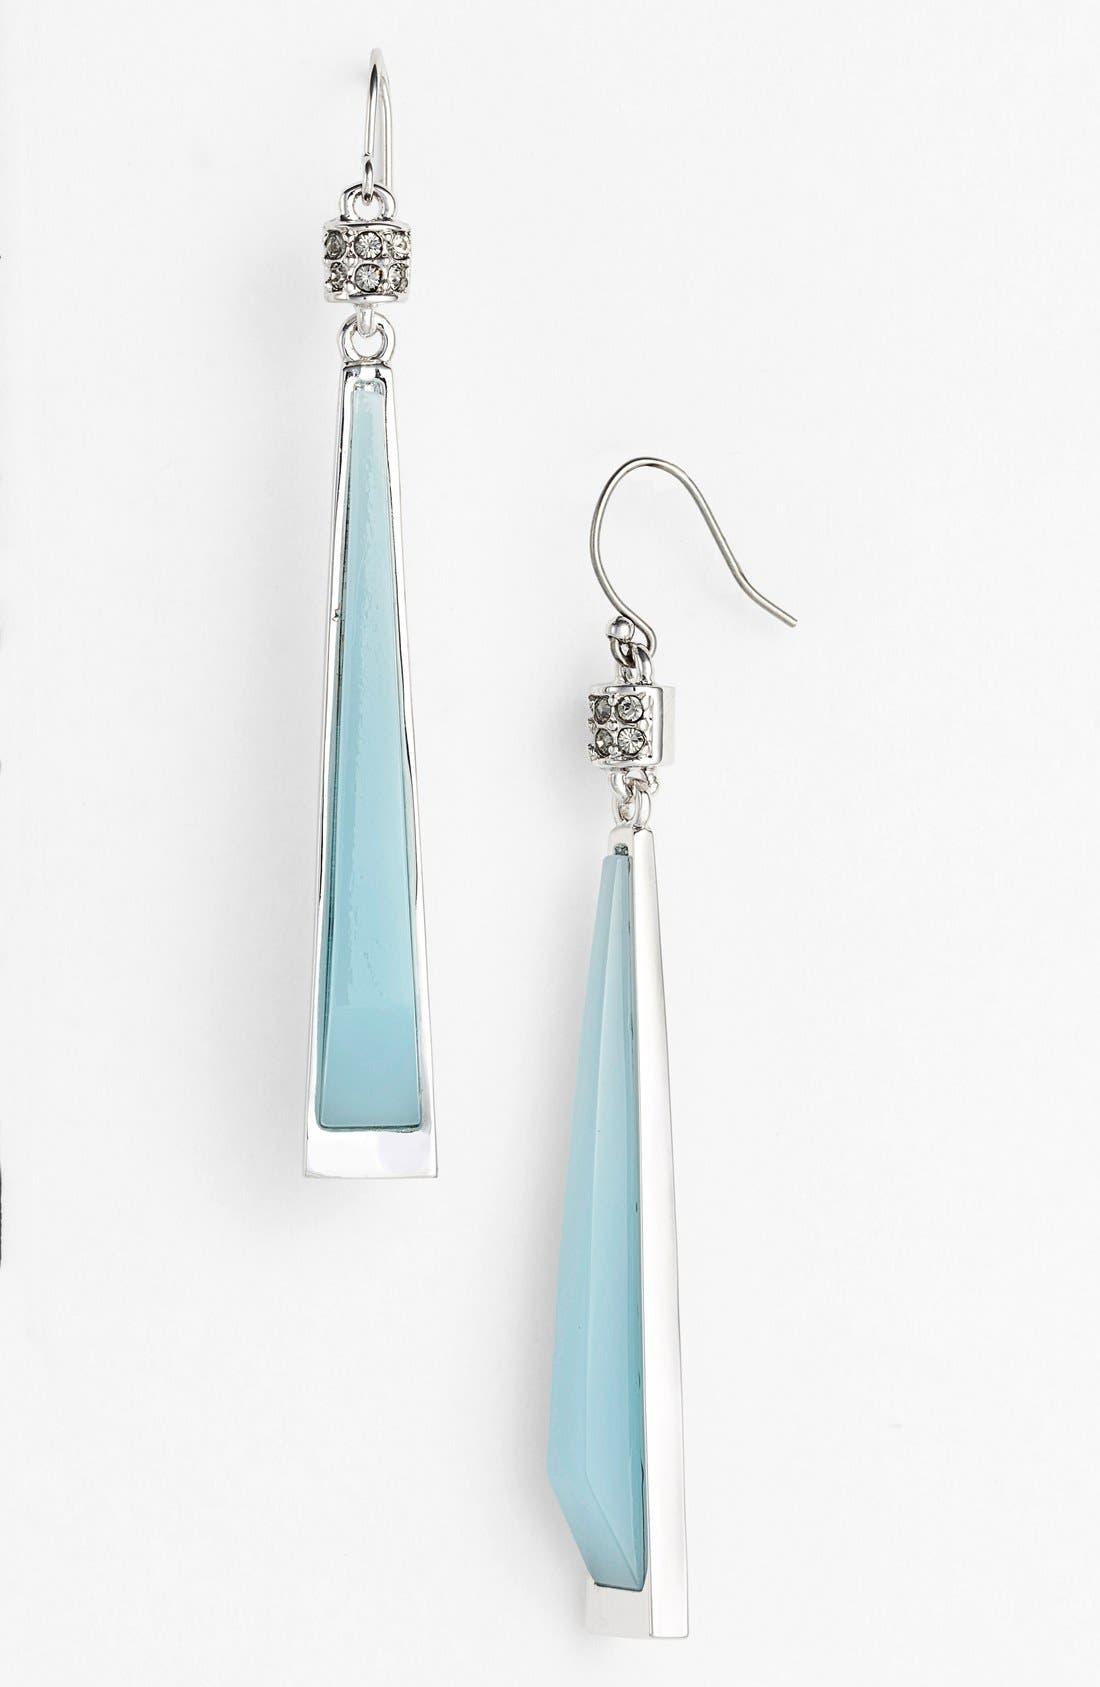 Alternate Image 1 Selected - Vince Camuto 'Blue Steel Silver' Drop Earrings